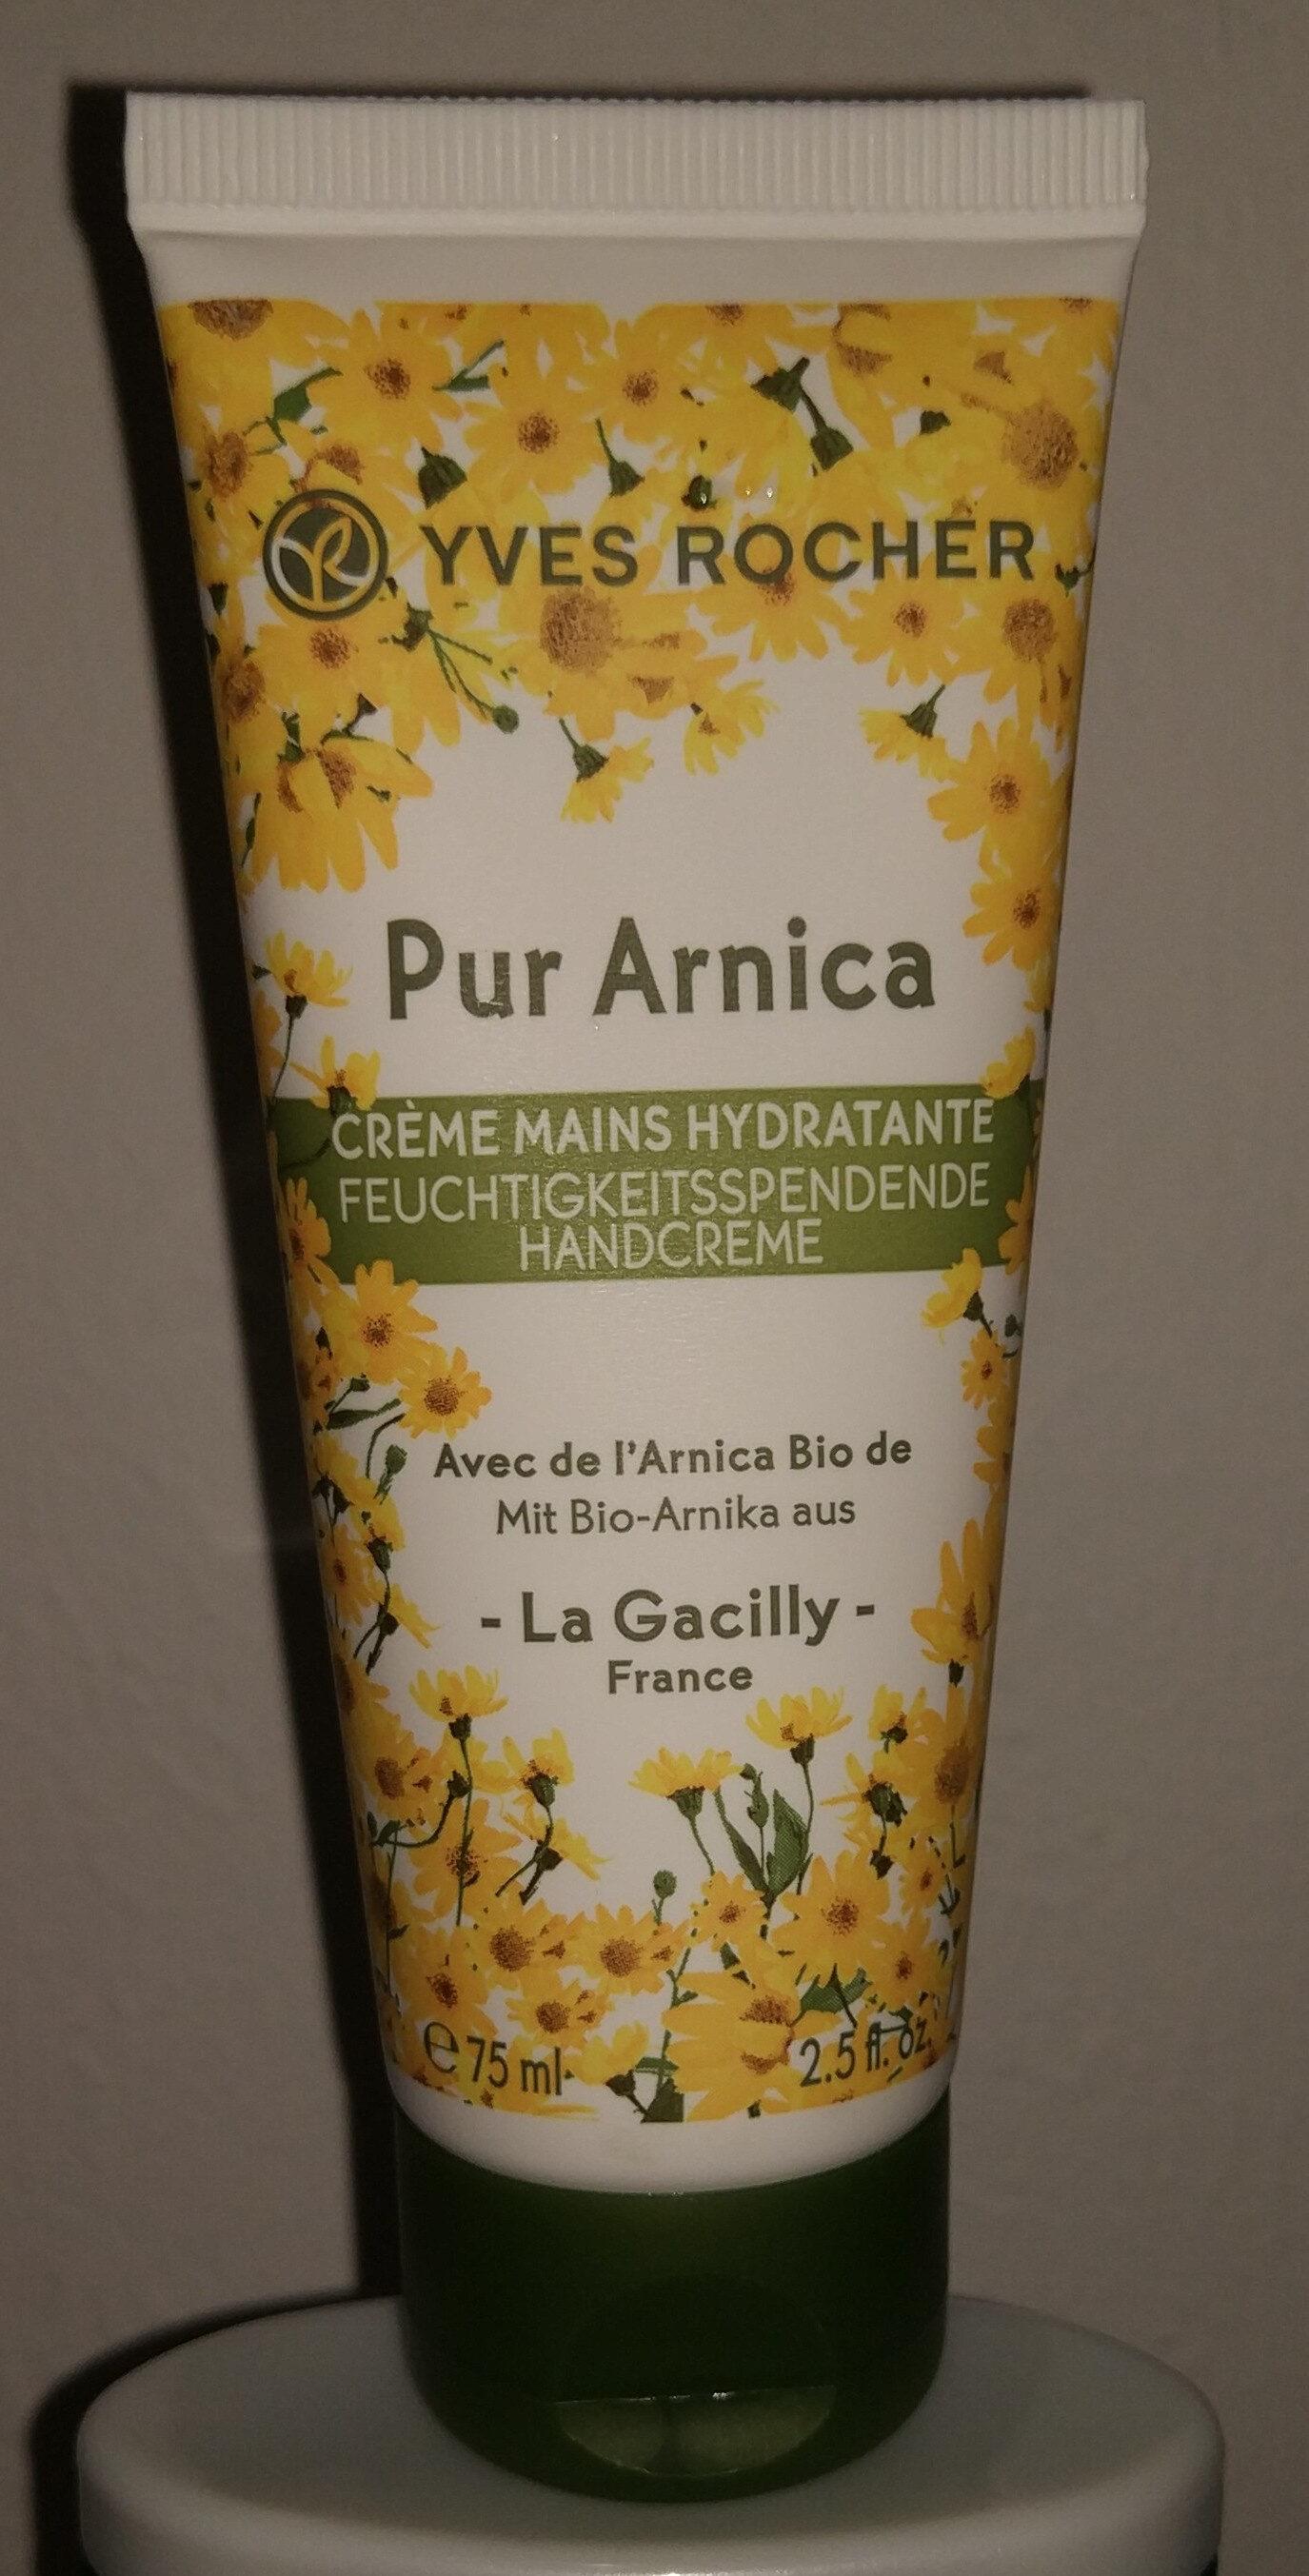 Feuchtigkeitsspendende Handcreme Pur Arnica - Produit - de